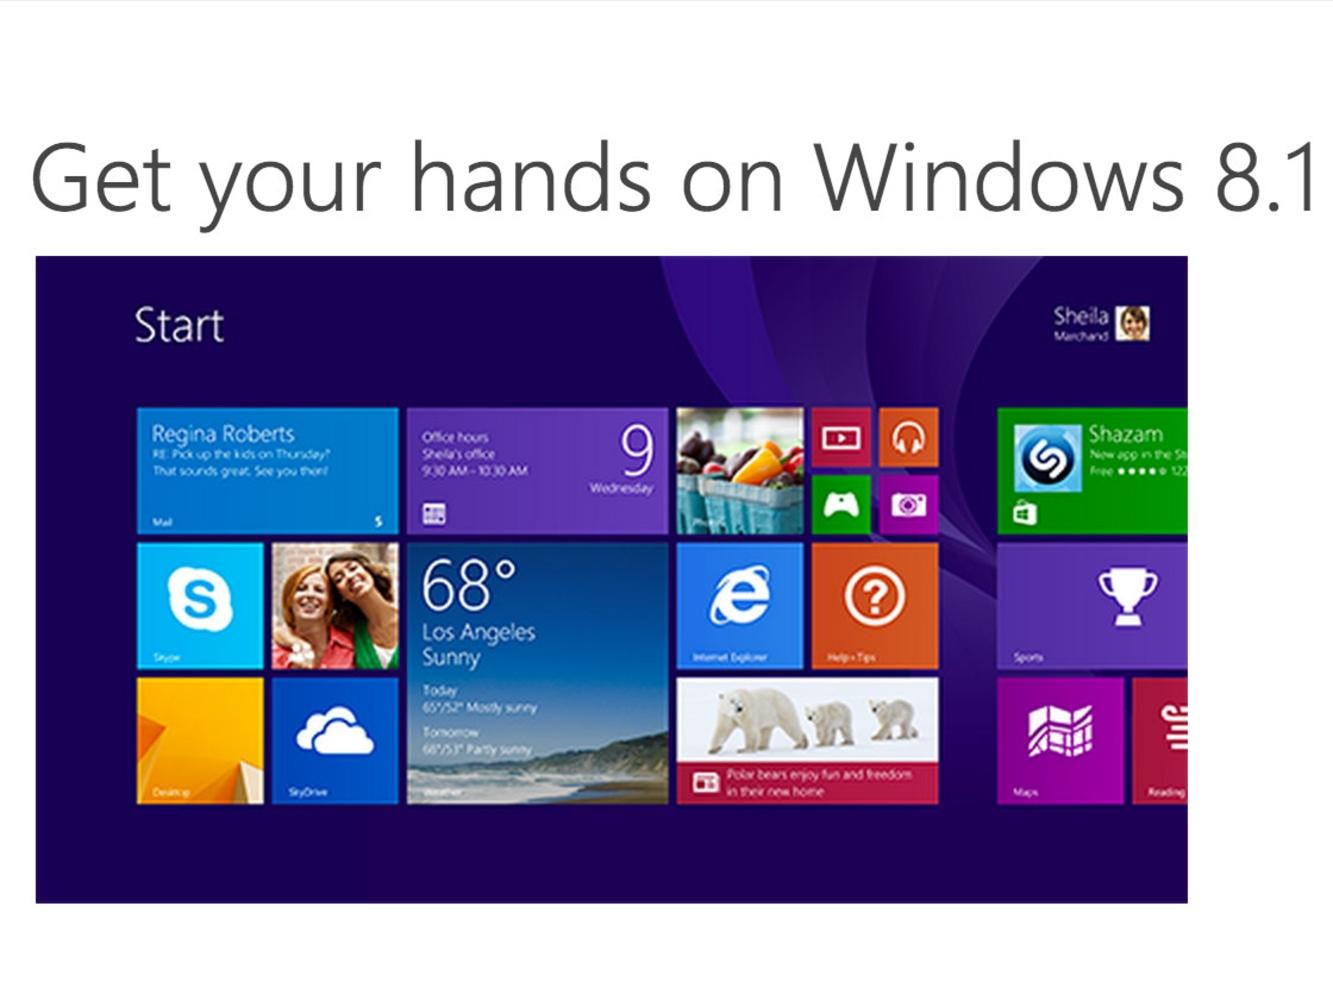 Microsoft pulls Windows update to fix problems